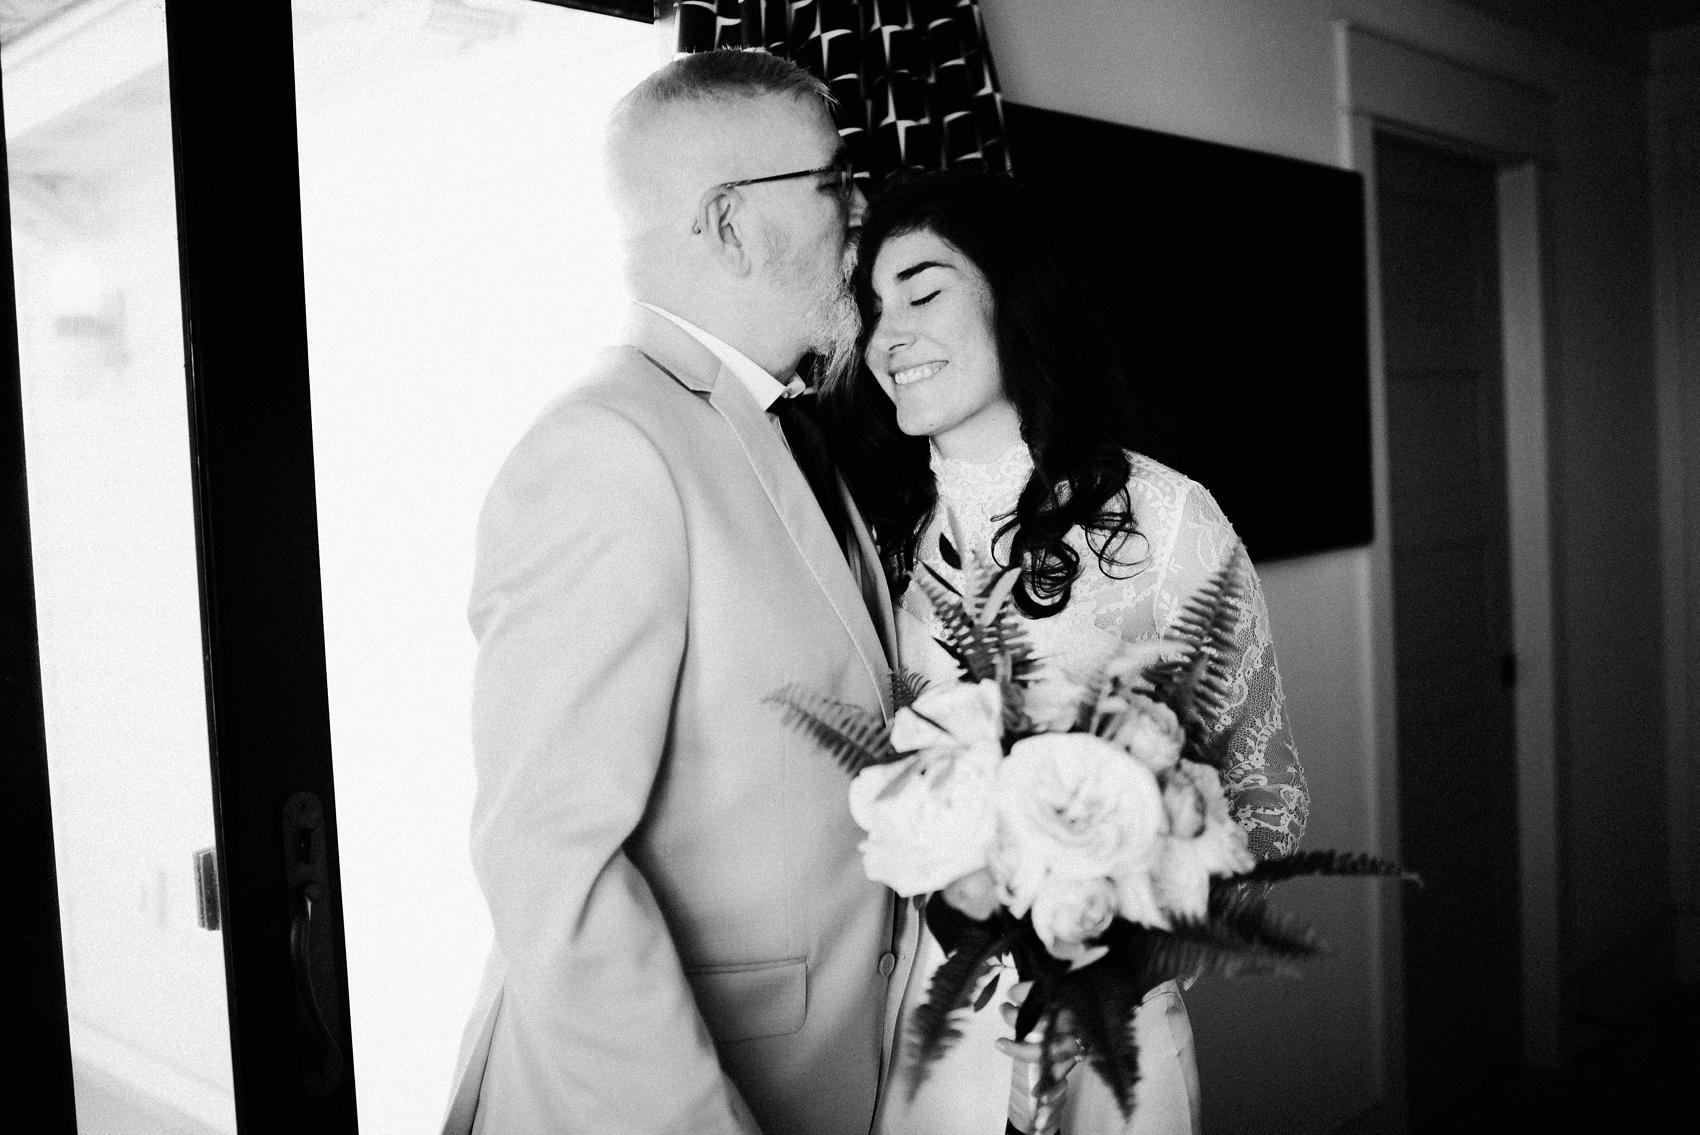 outerbanks_wedding_photographer_1254.jpg